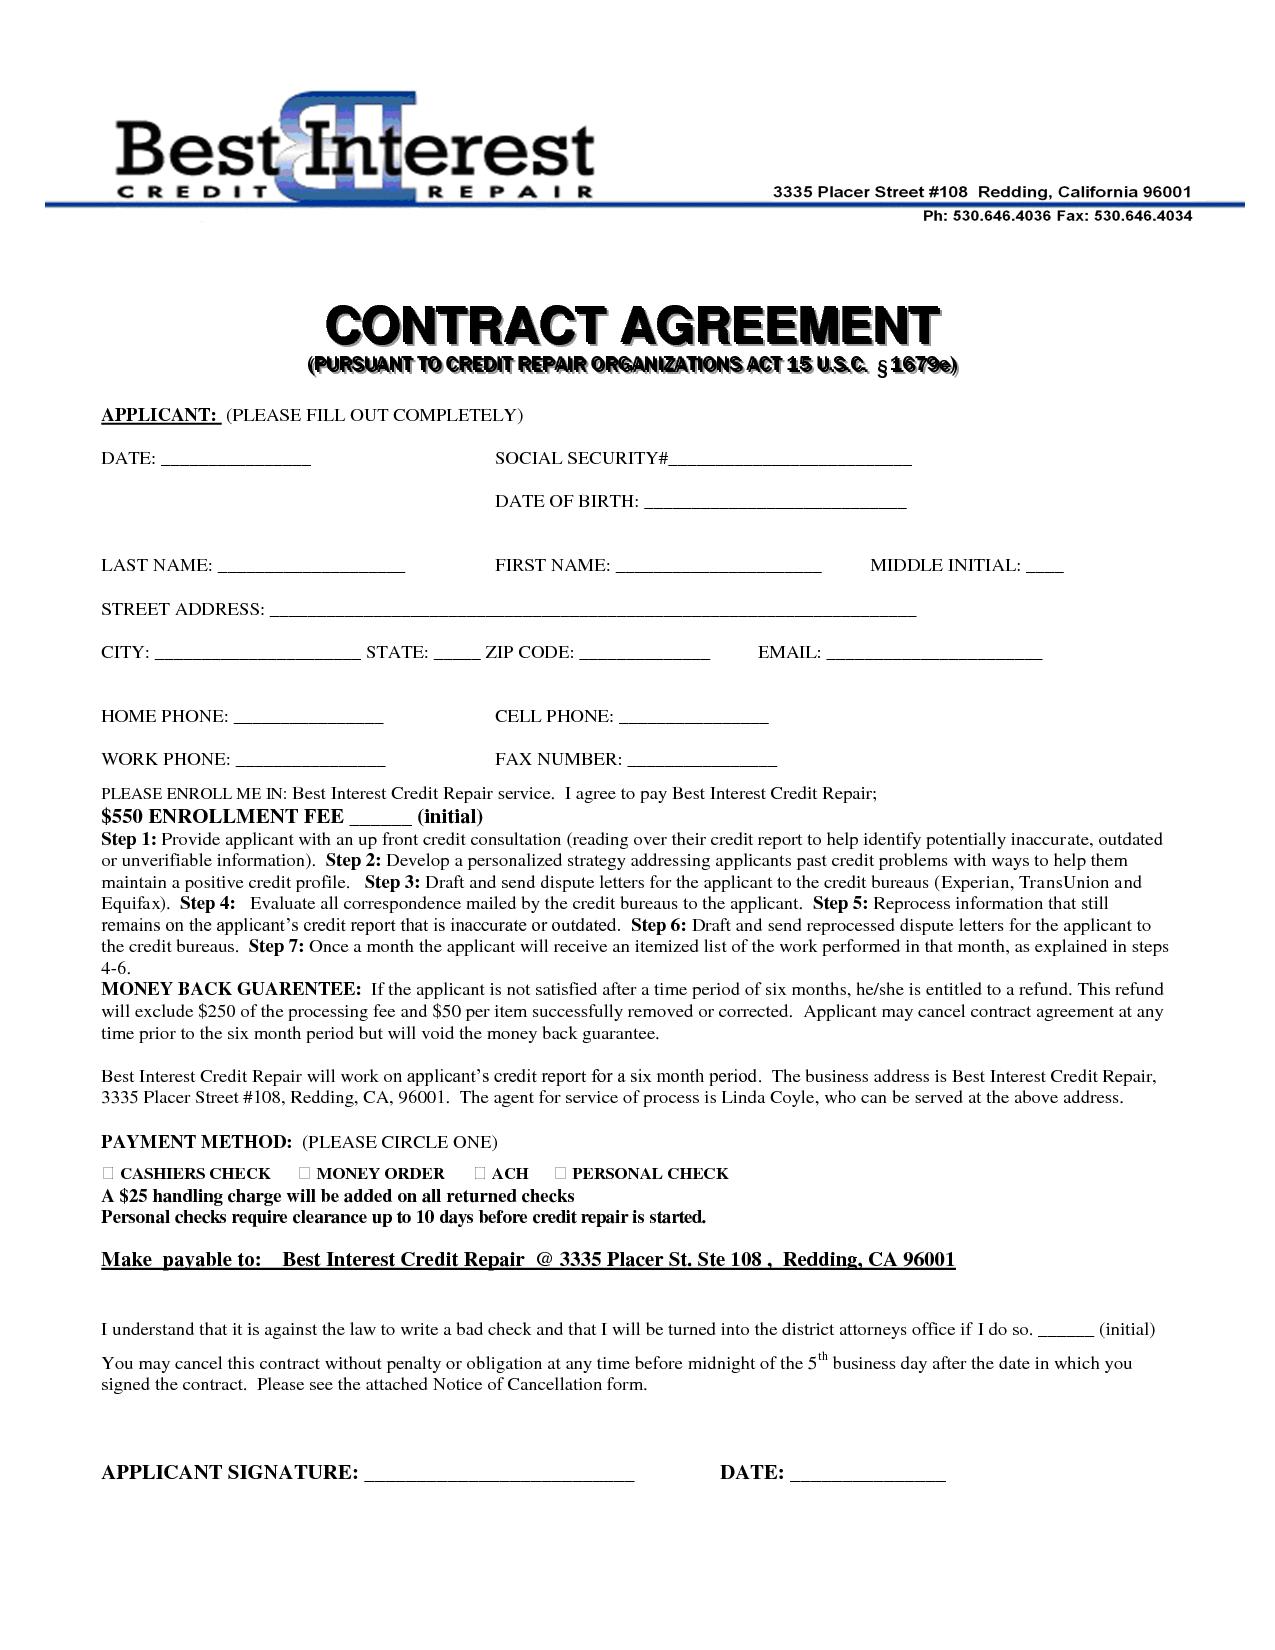 Repossession Dispute Letter Template - Credit Repair Contract Template Credit Repair Secrets Exposed Here